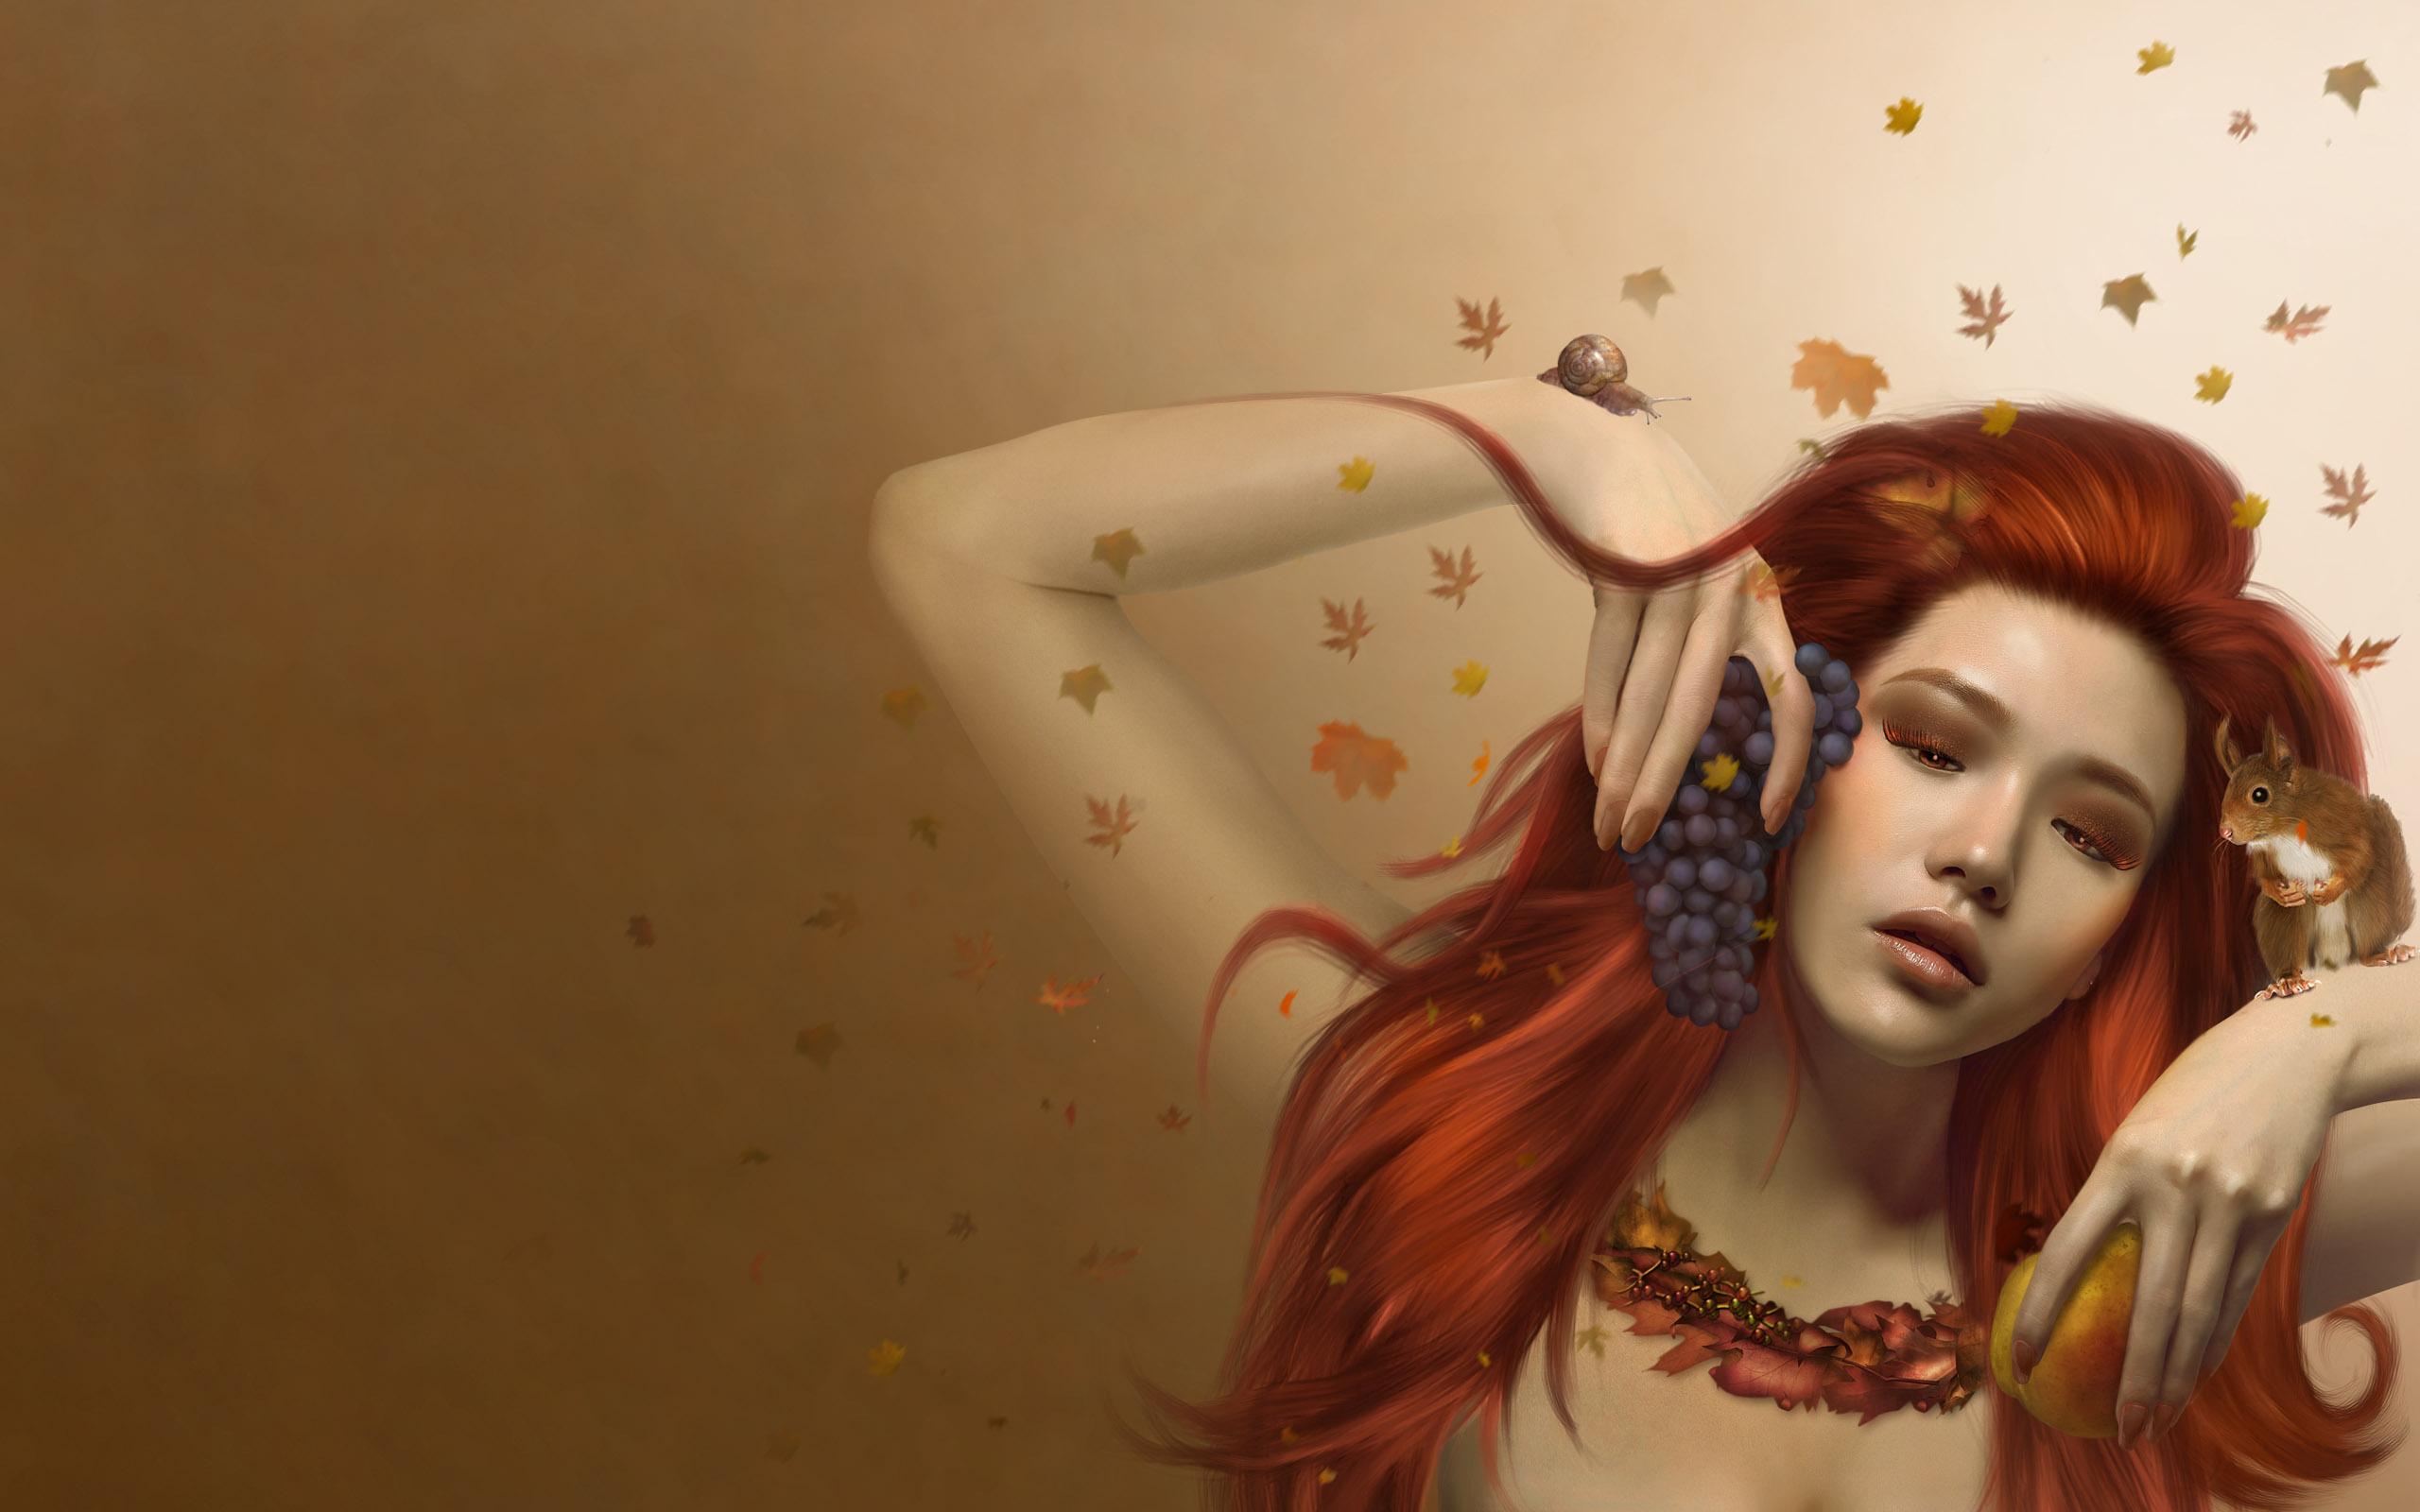 artistic girl wallpaper - sf wallpaper